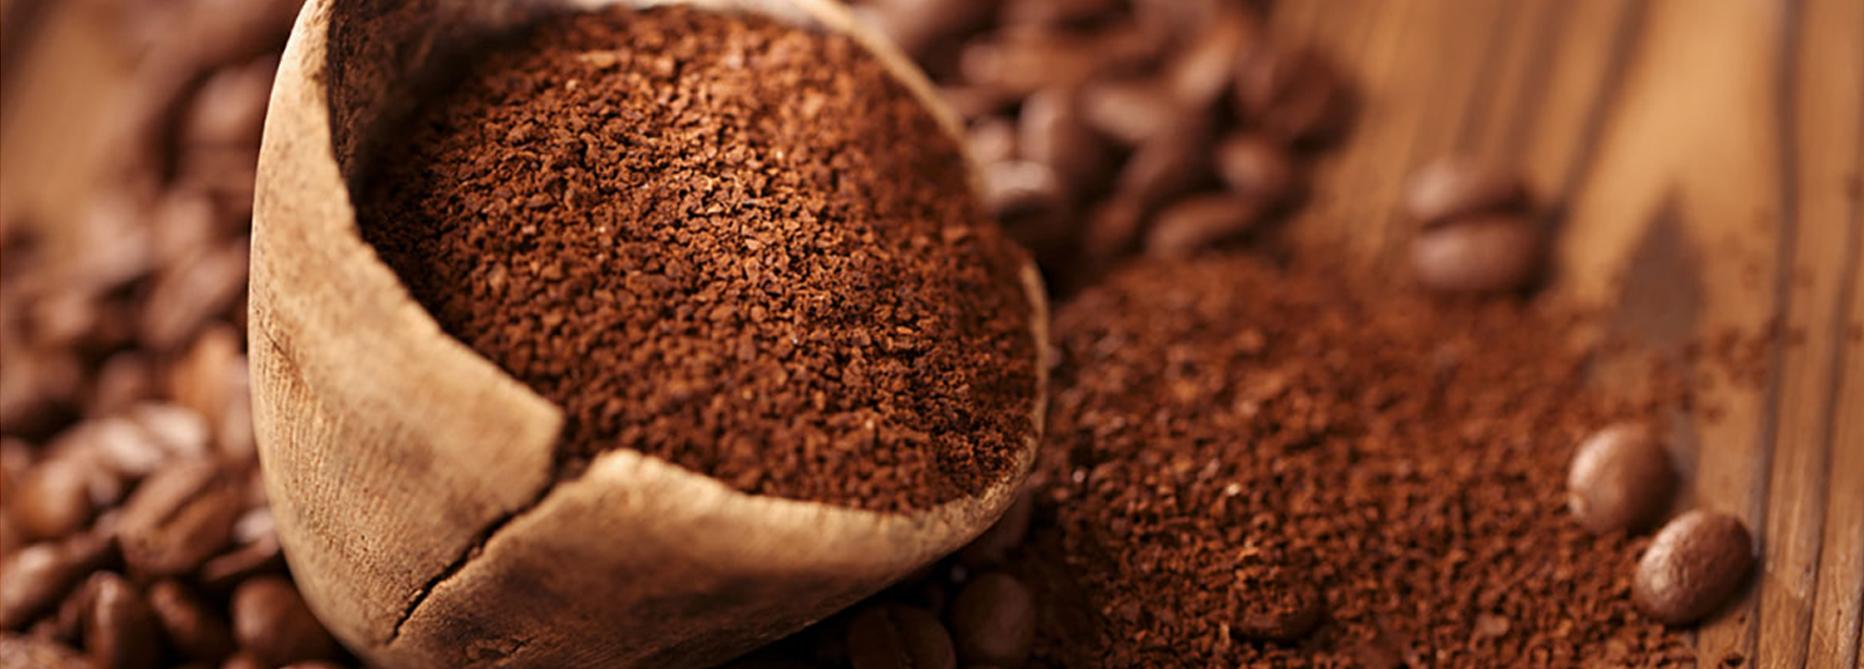 Miscele di Caffè Macinato